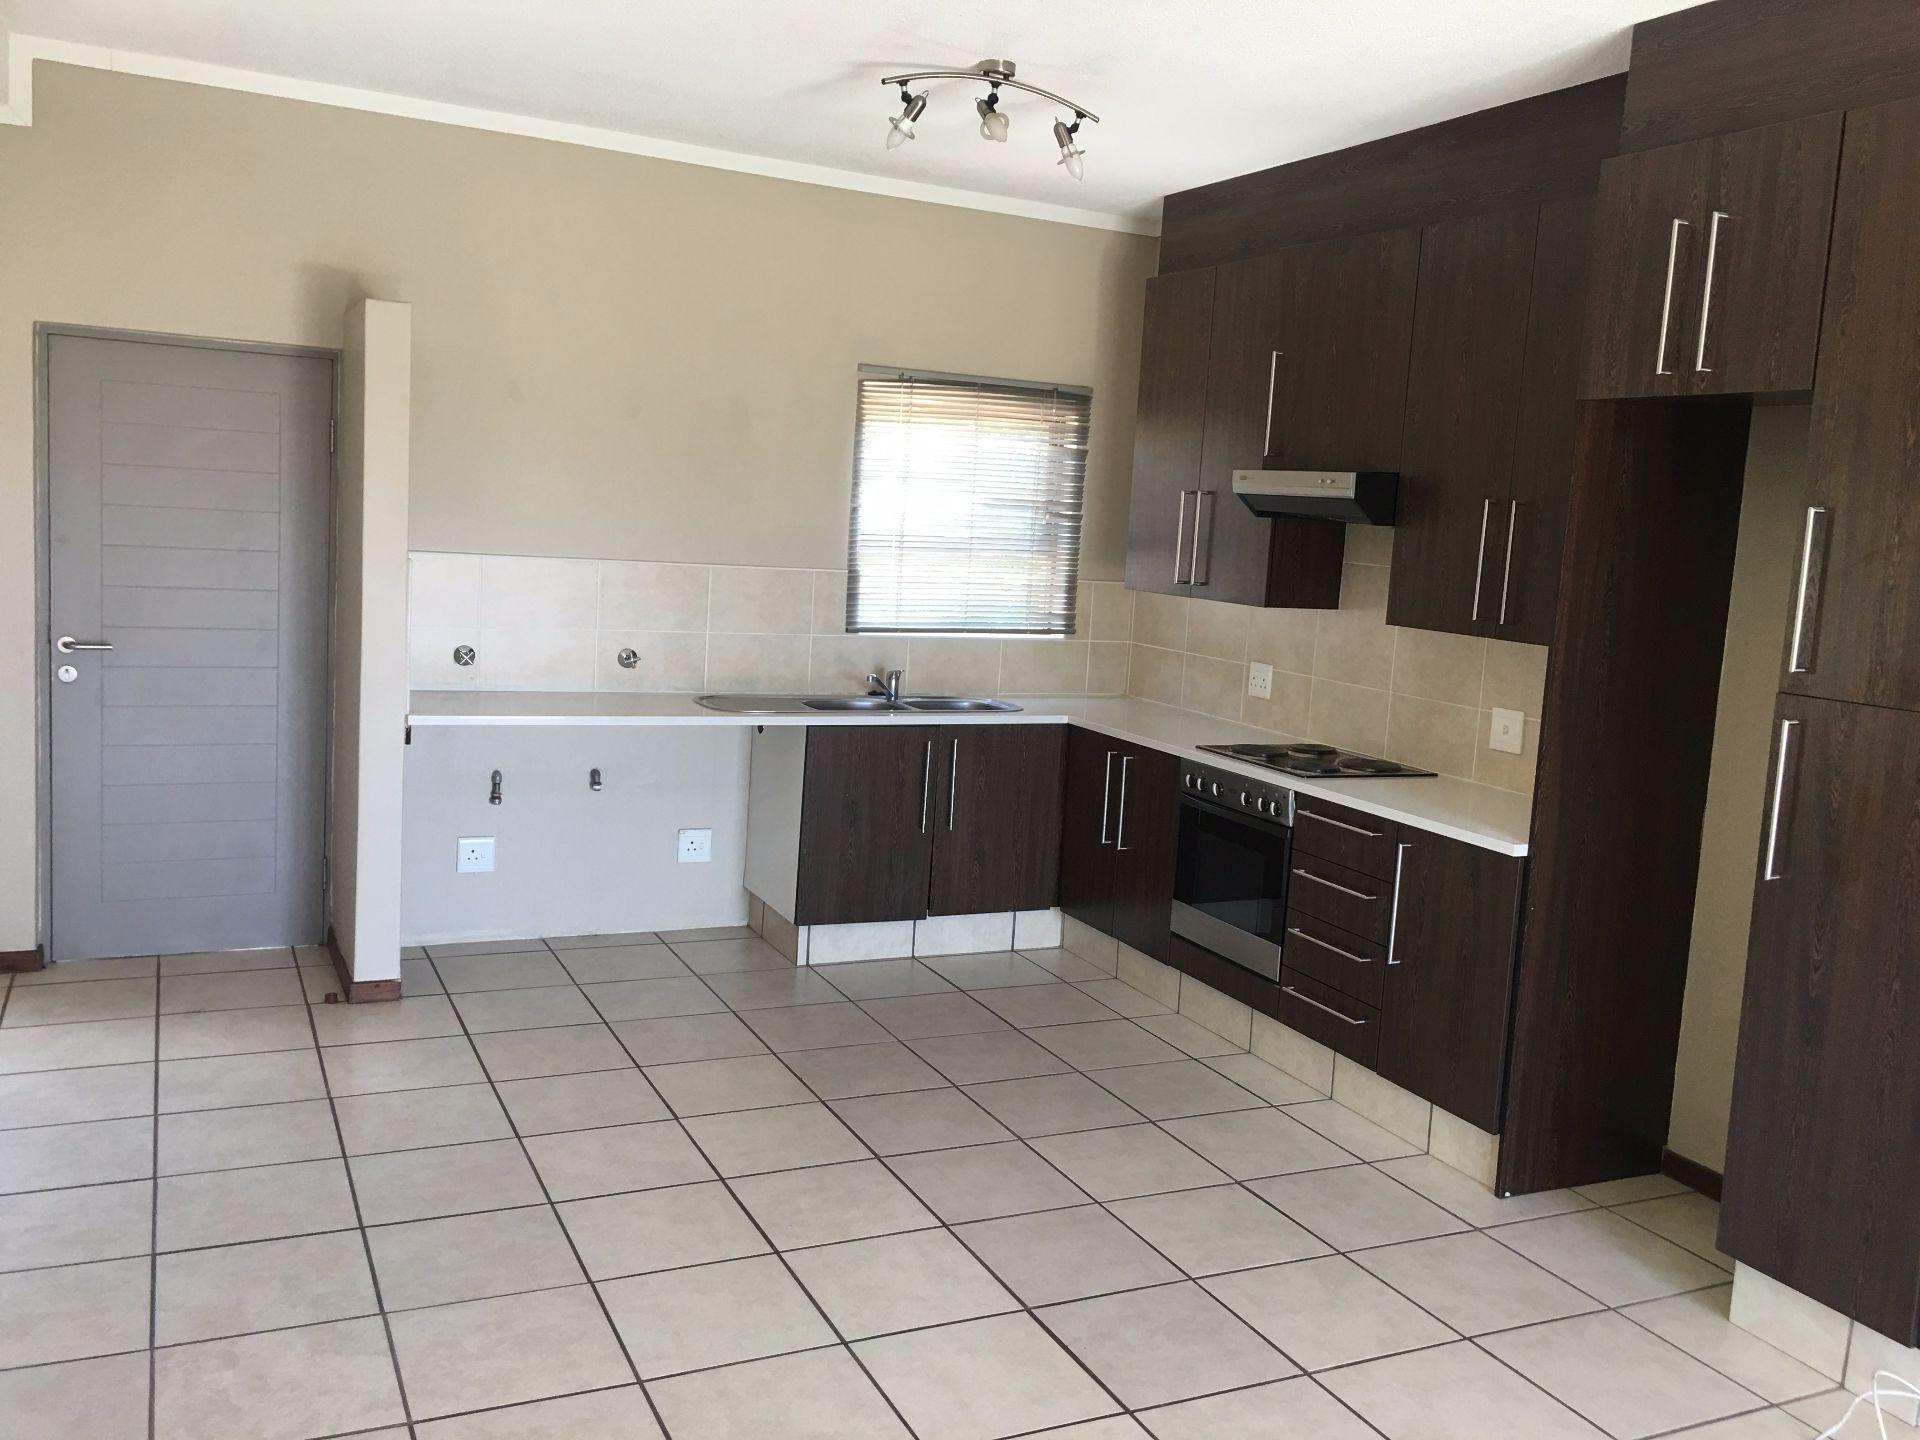 Broadacres property for sale. Ref No: 13552745. Picture no 3